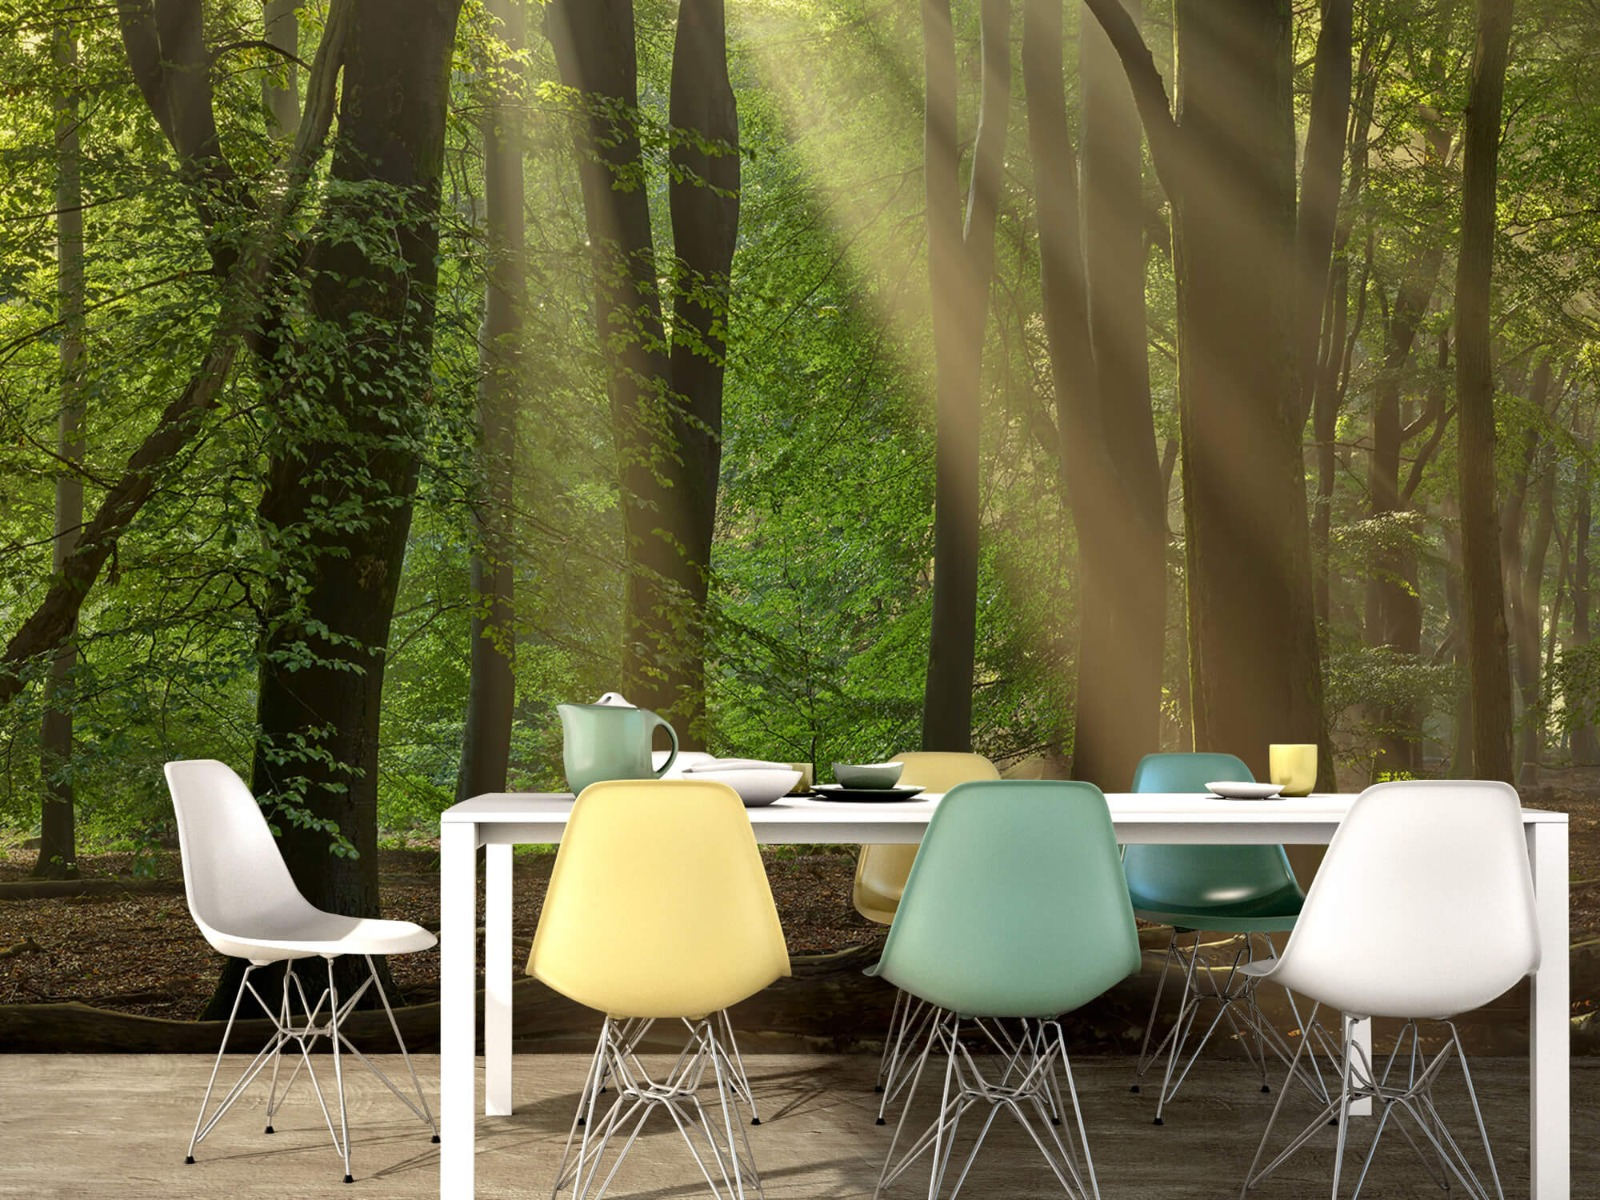 Bomen - Zonneharpen in het bos - Slaapkamer 16